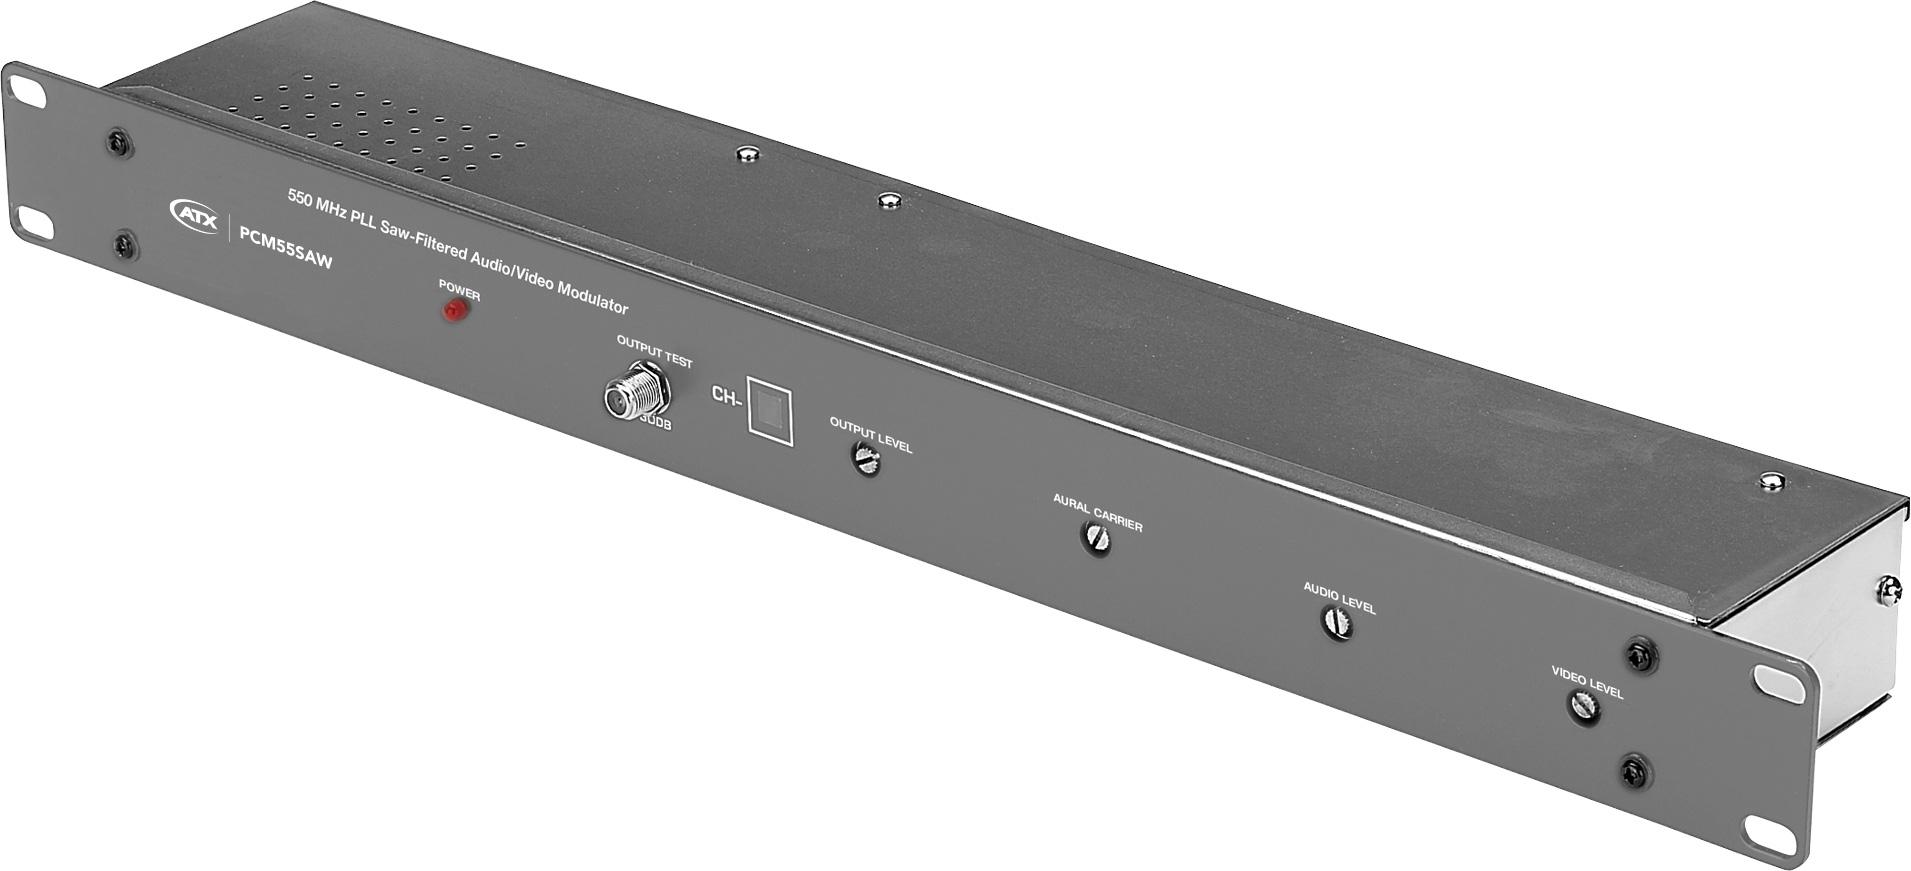 1 Channel Crystal A/V Modulator - Channel 13 PM-PCM55SAW-13